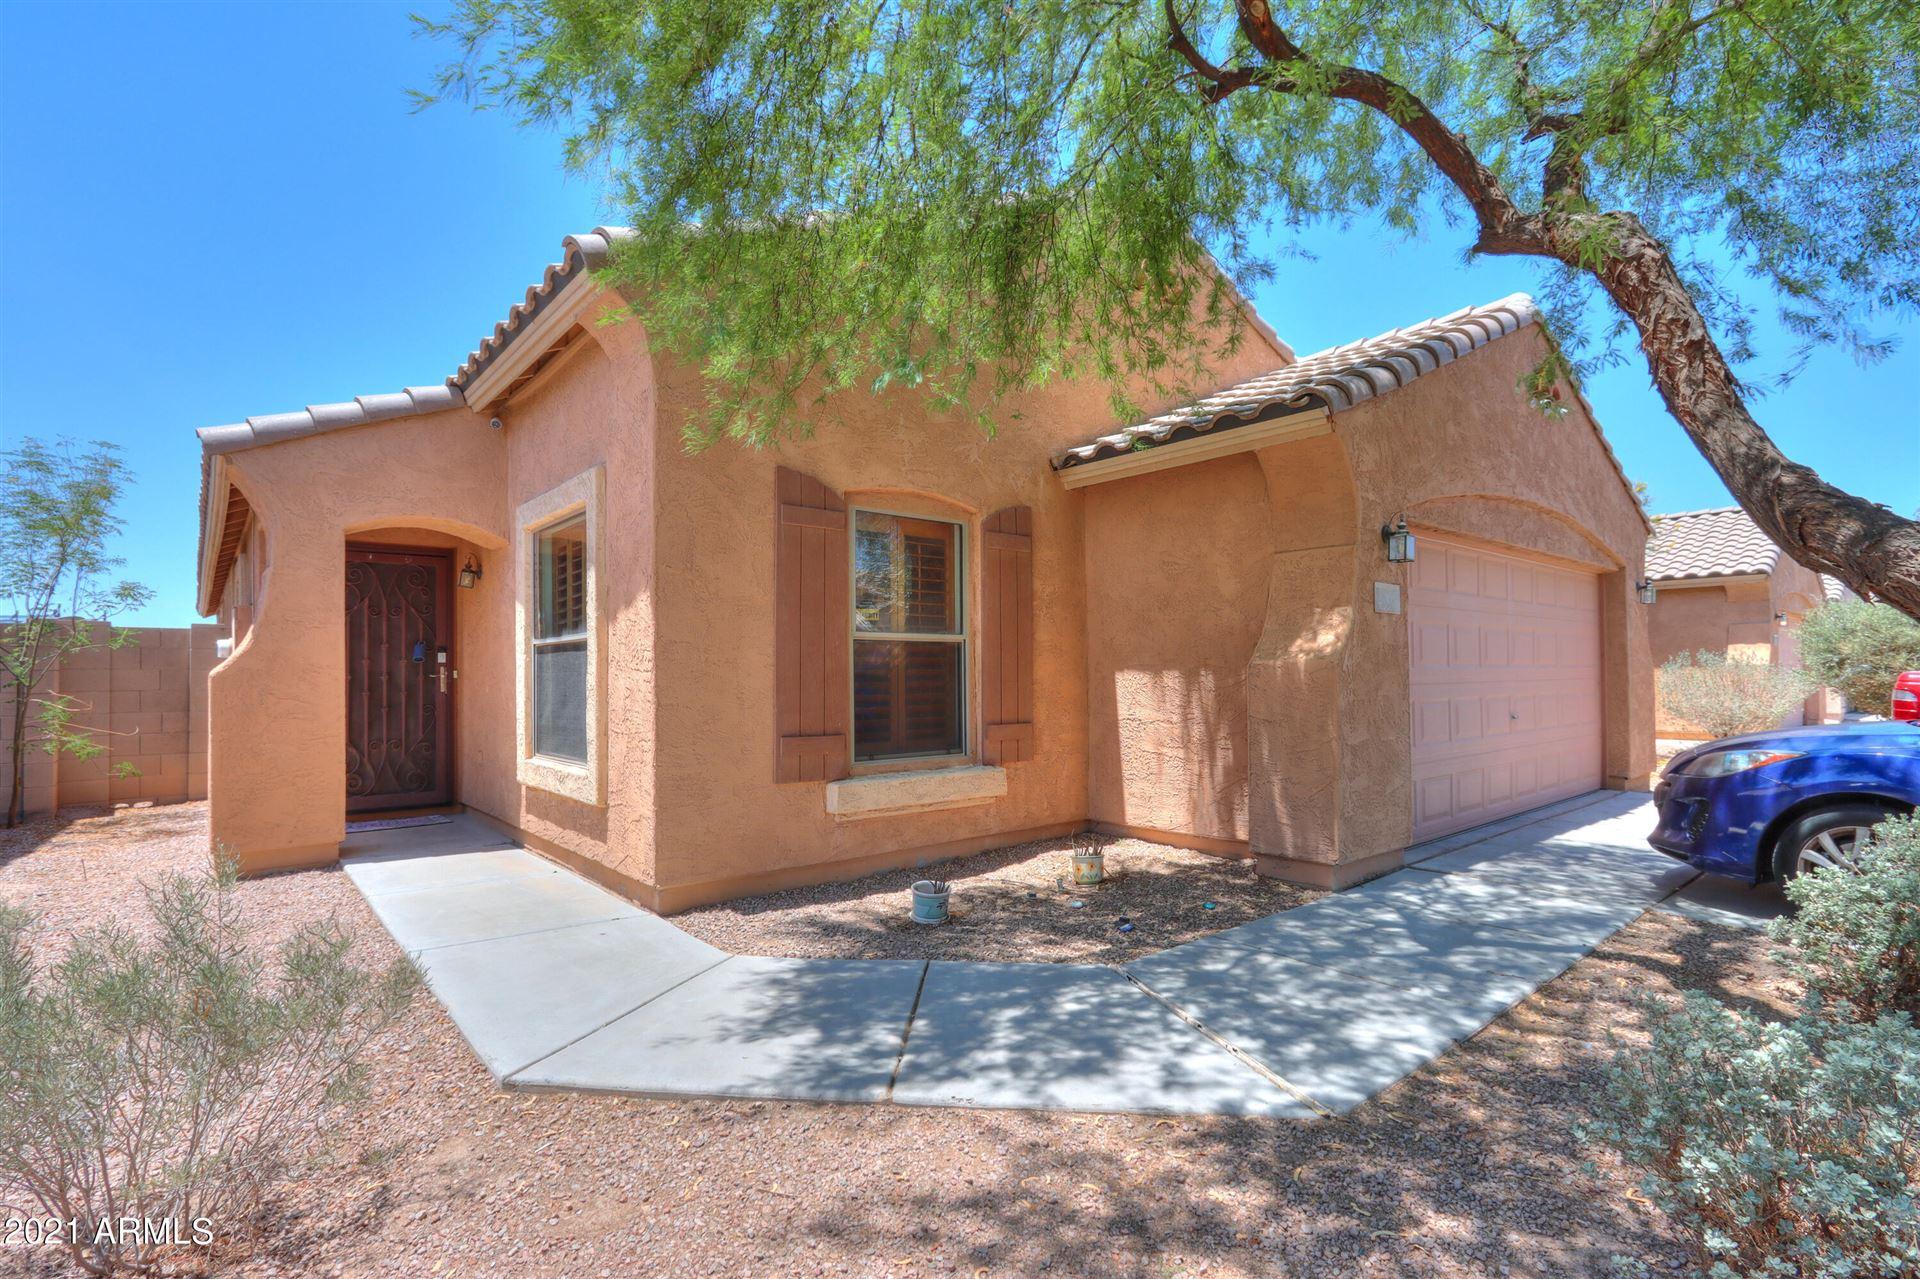 Photo for 43971 W COWPATH Road, Maricopa, AZ 85138 (MLS # 6262799)